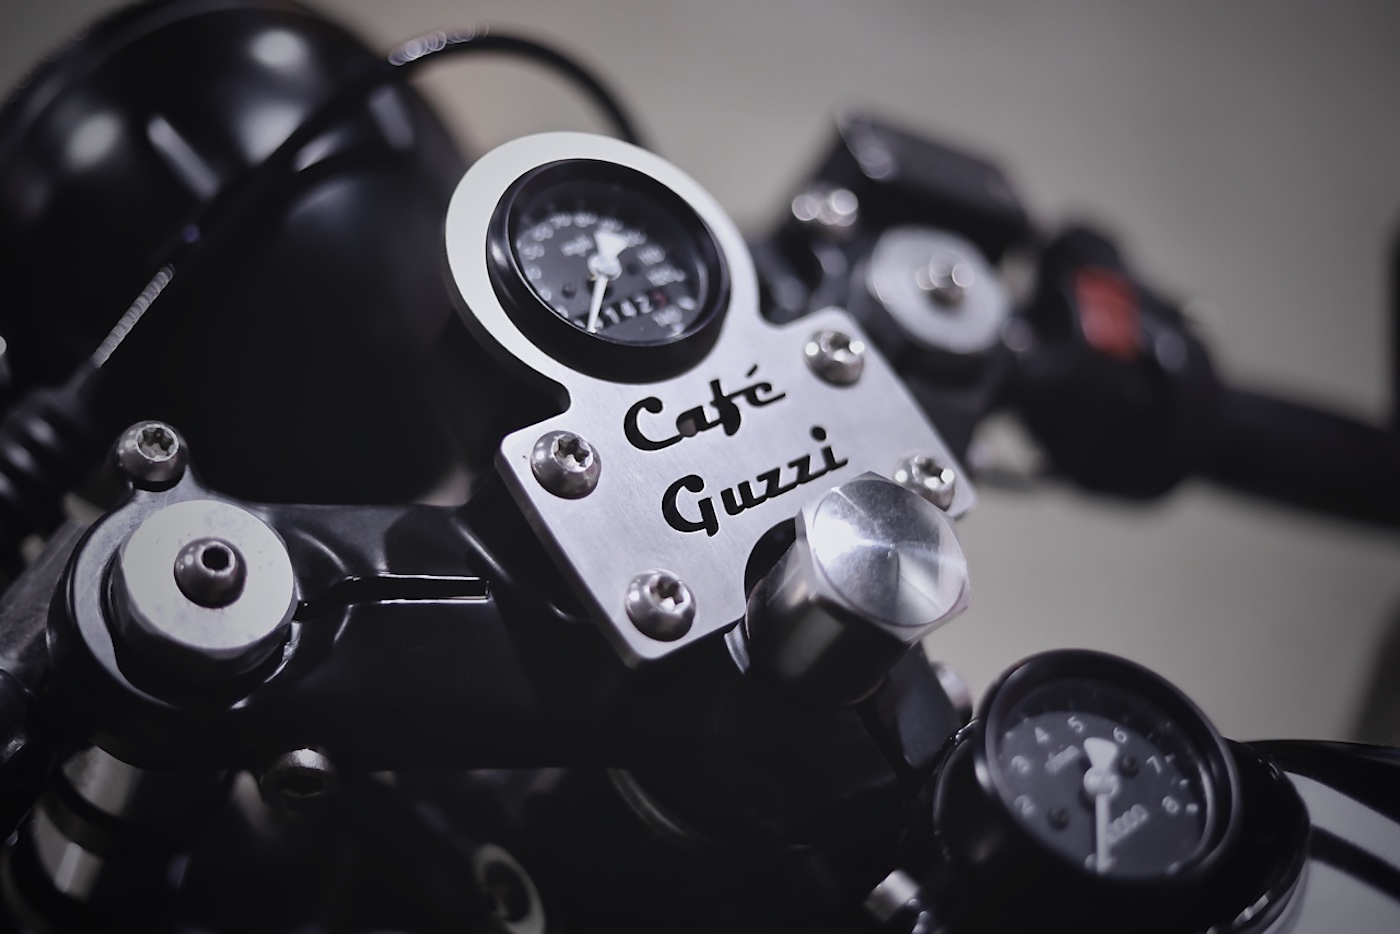 MOTO GUZZI CAFE RACER | RENCHLIST